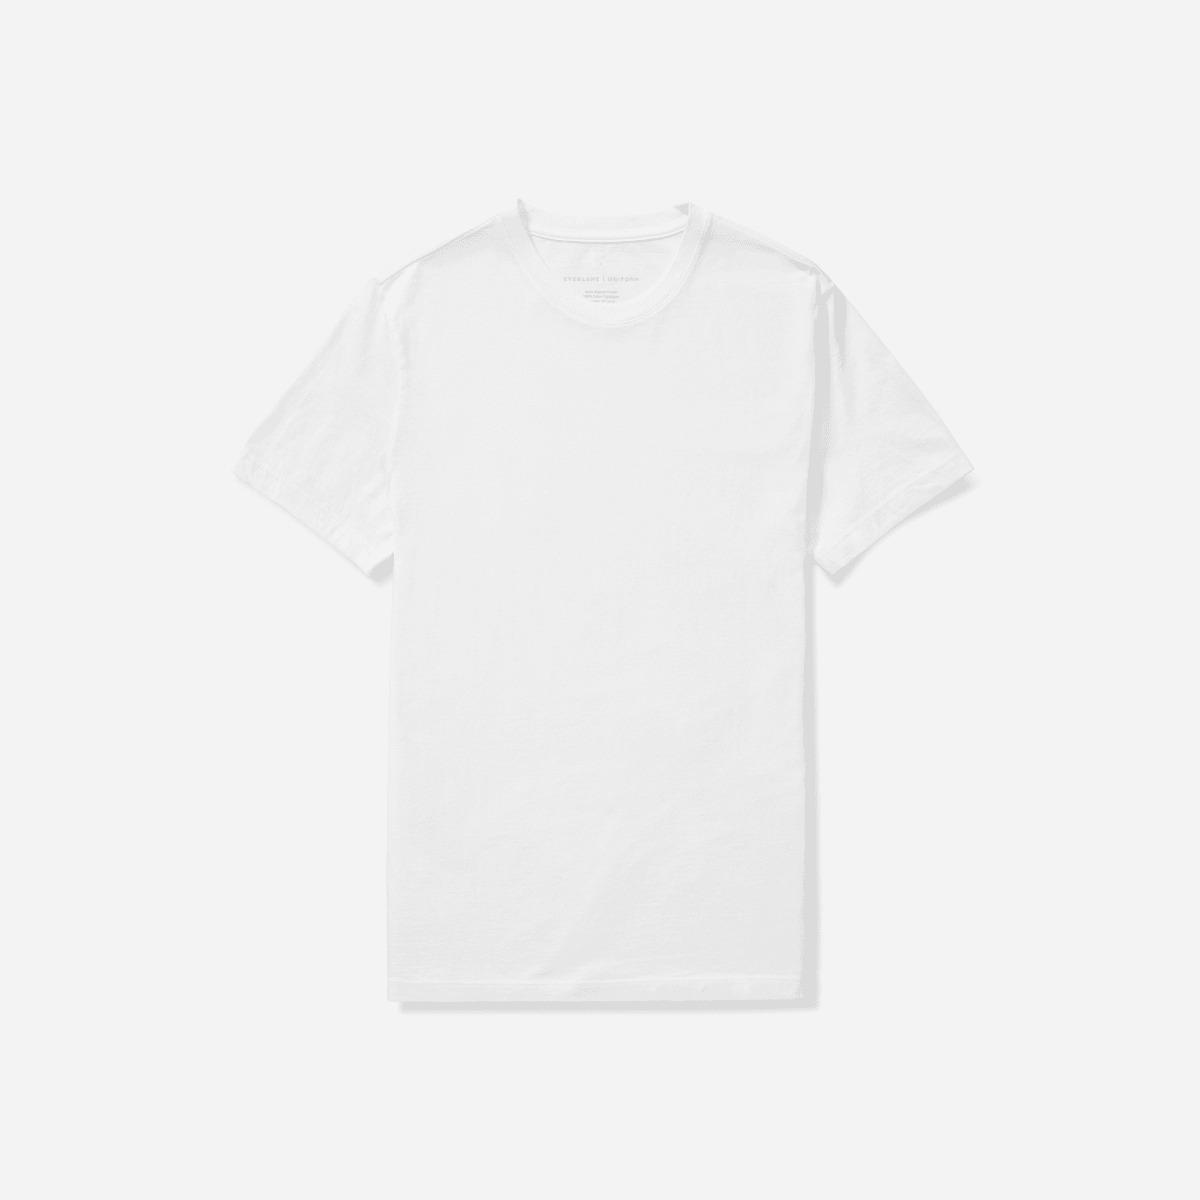 Everlane Organic Cotton Crew Uniform T-Shirt in white